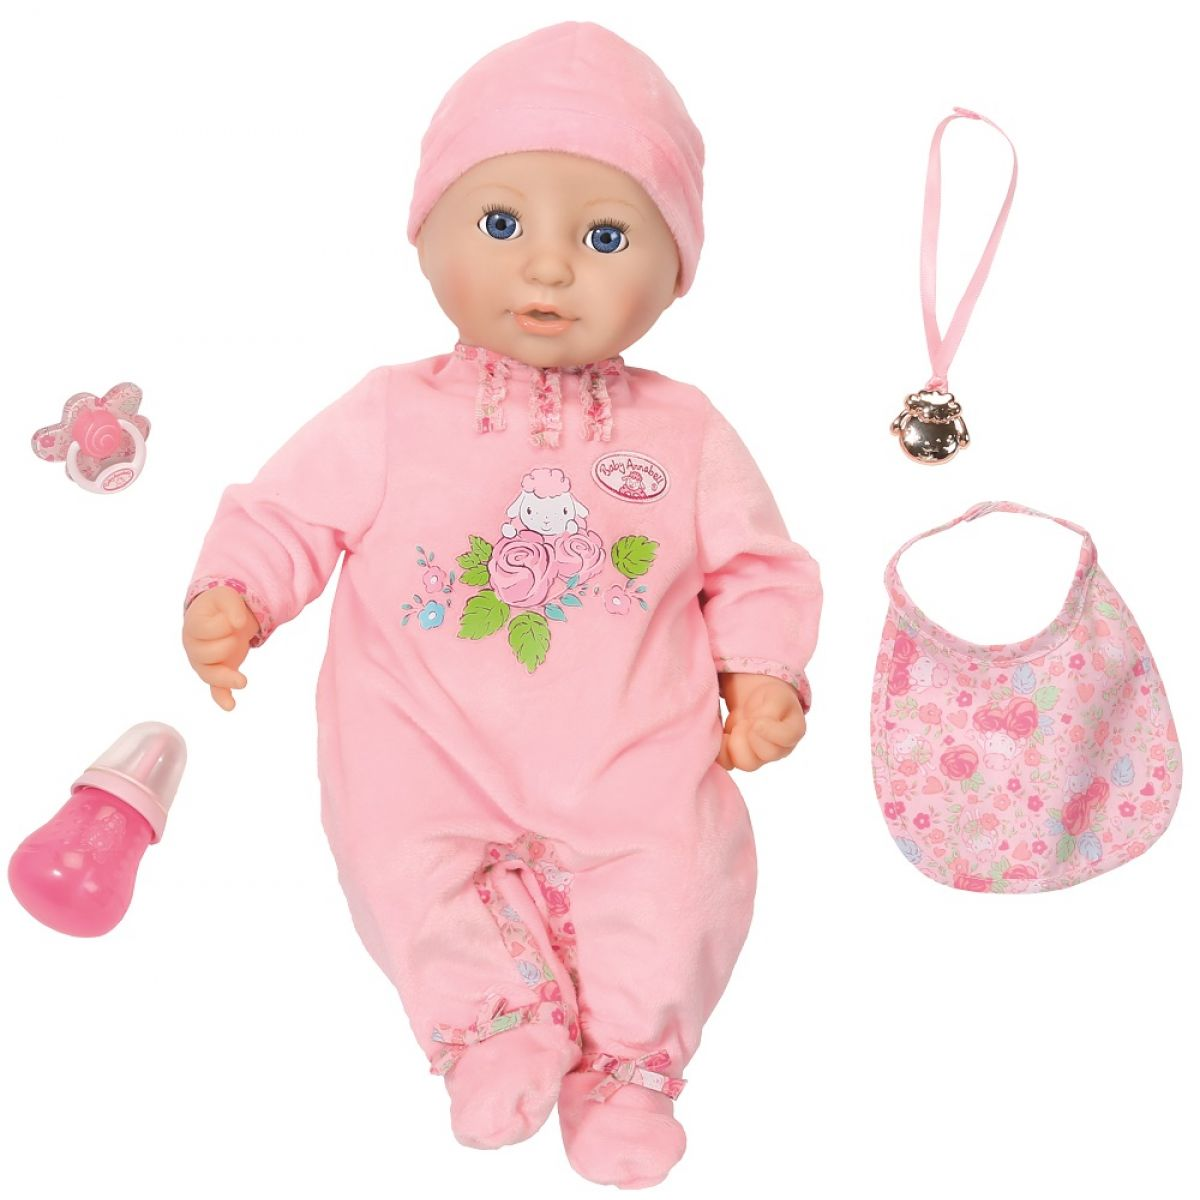 Zapf Creation Baby Annabell Panenka 43cm - Poškozený obal